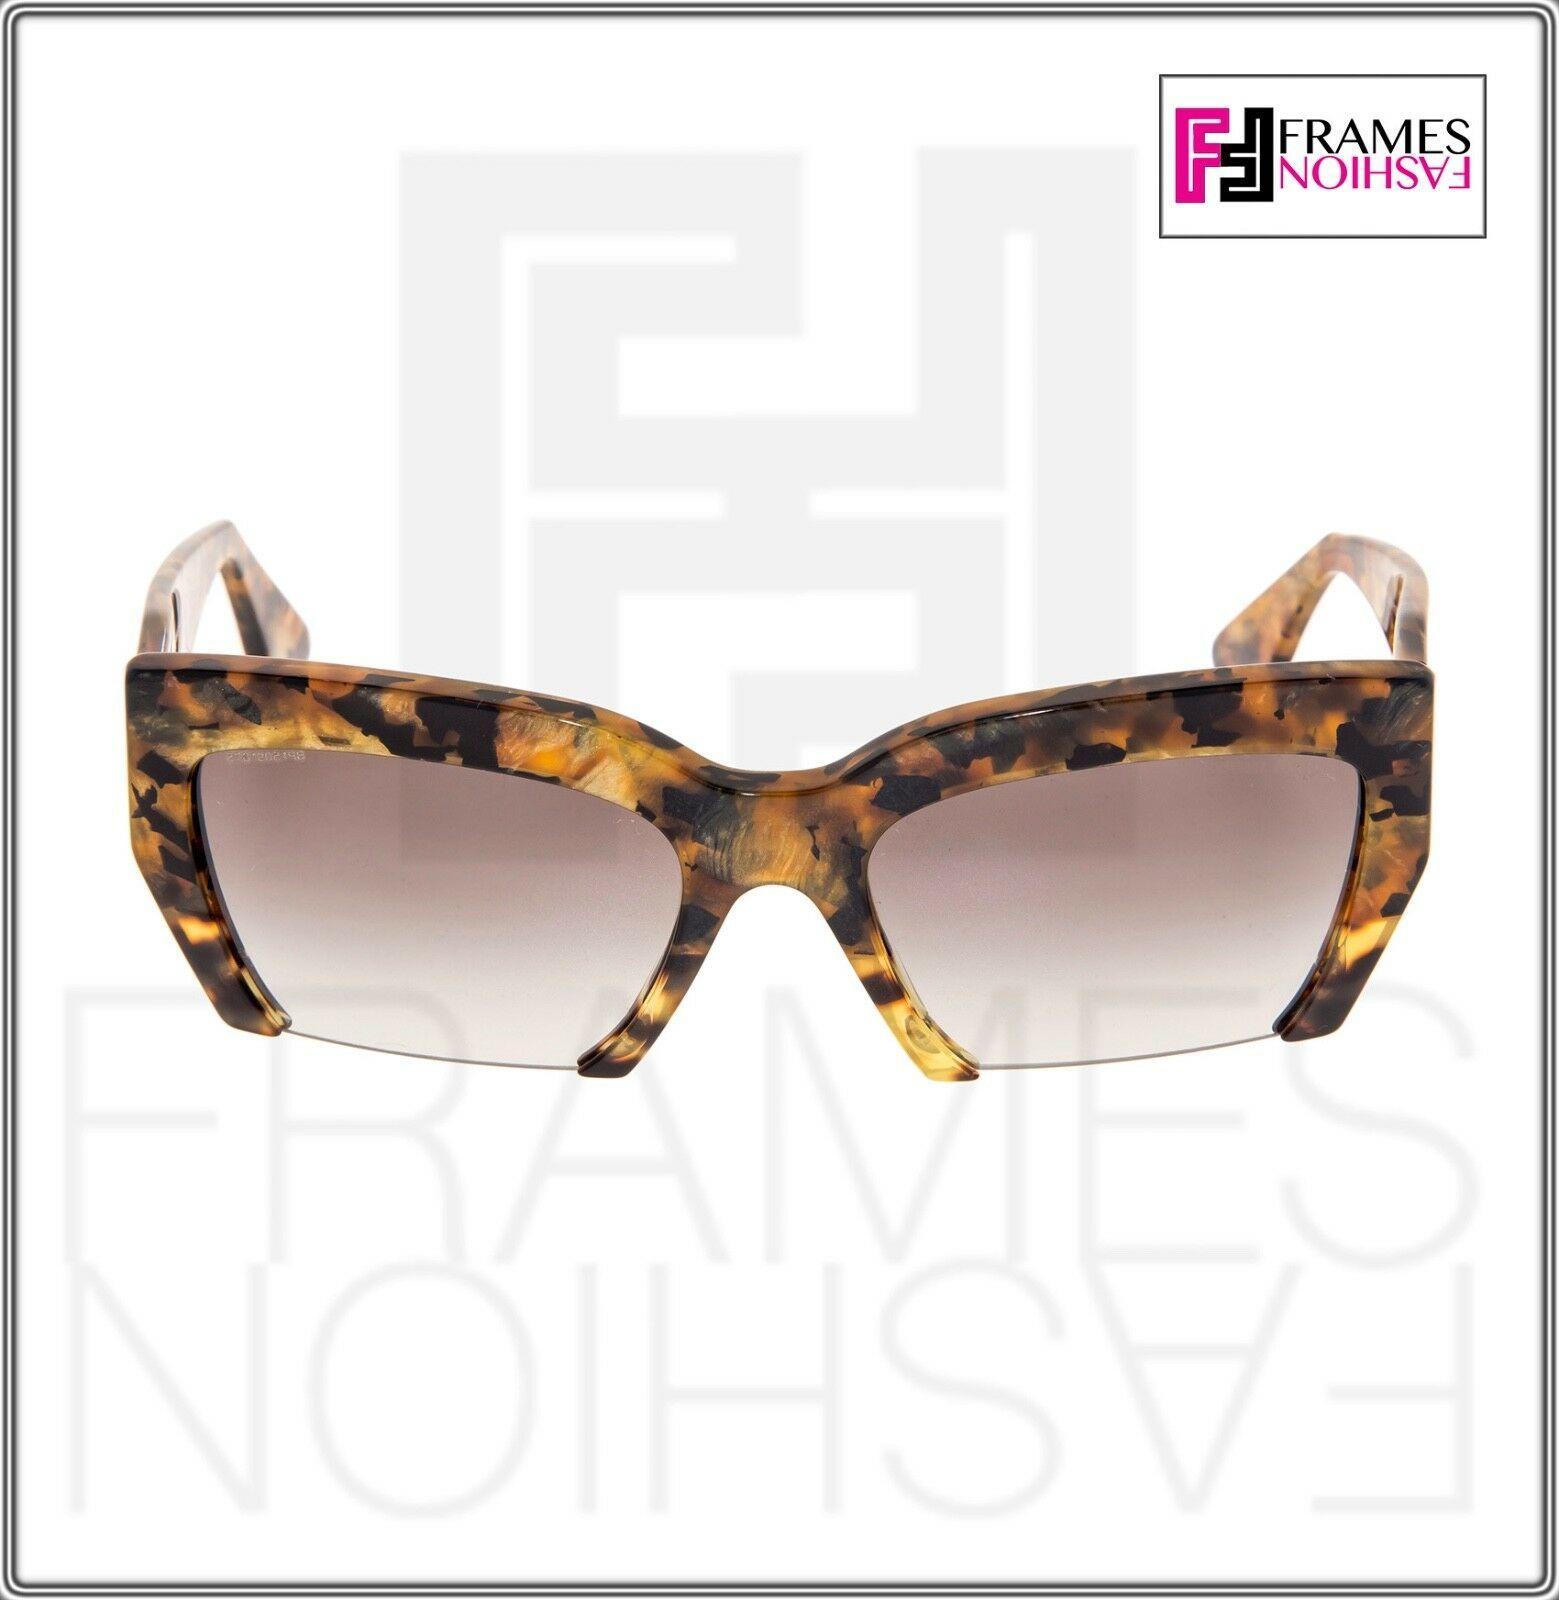 MIU MIU RASOIR 11O Square Sunglasses MAN-0A7 Caramel Marble Sunglasses MU11OS image 6